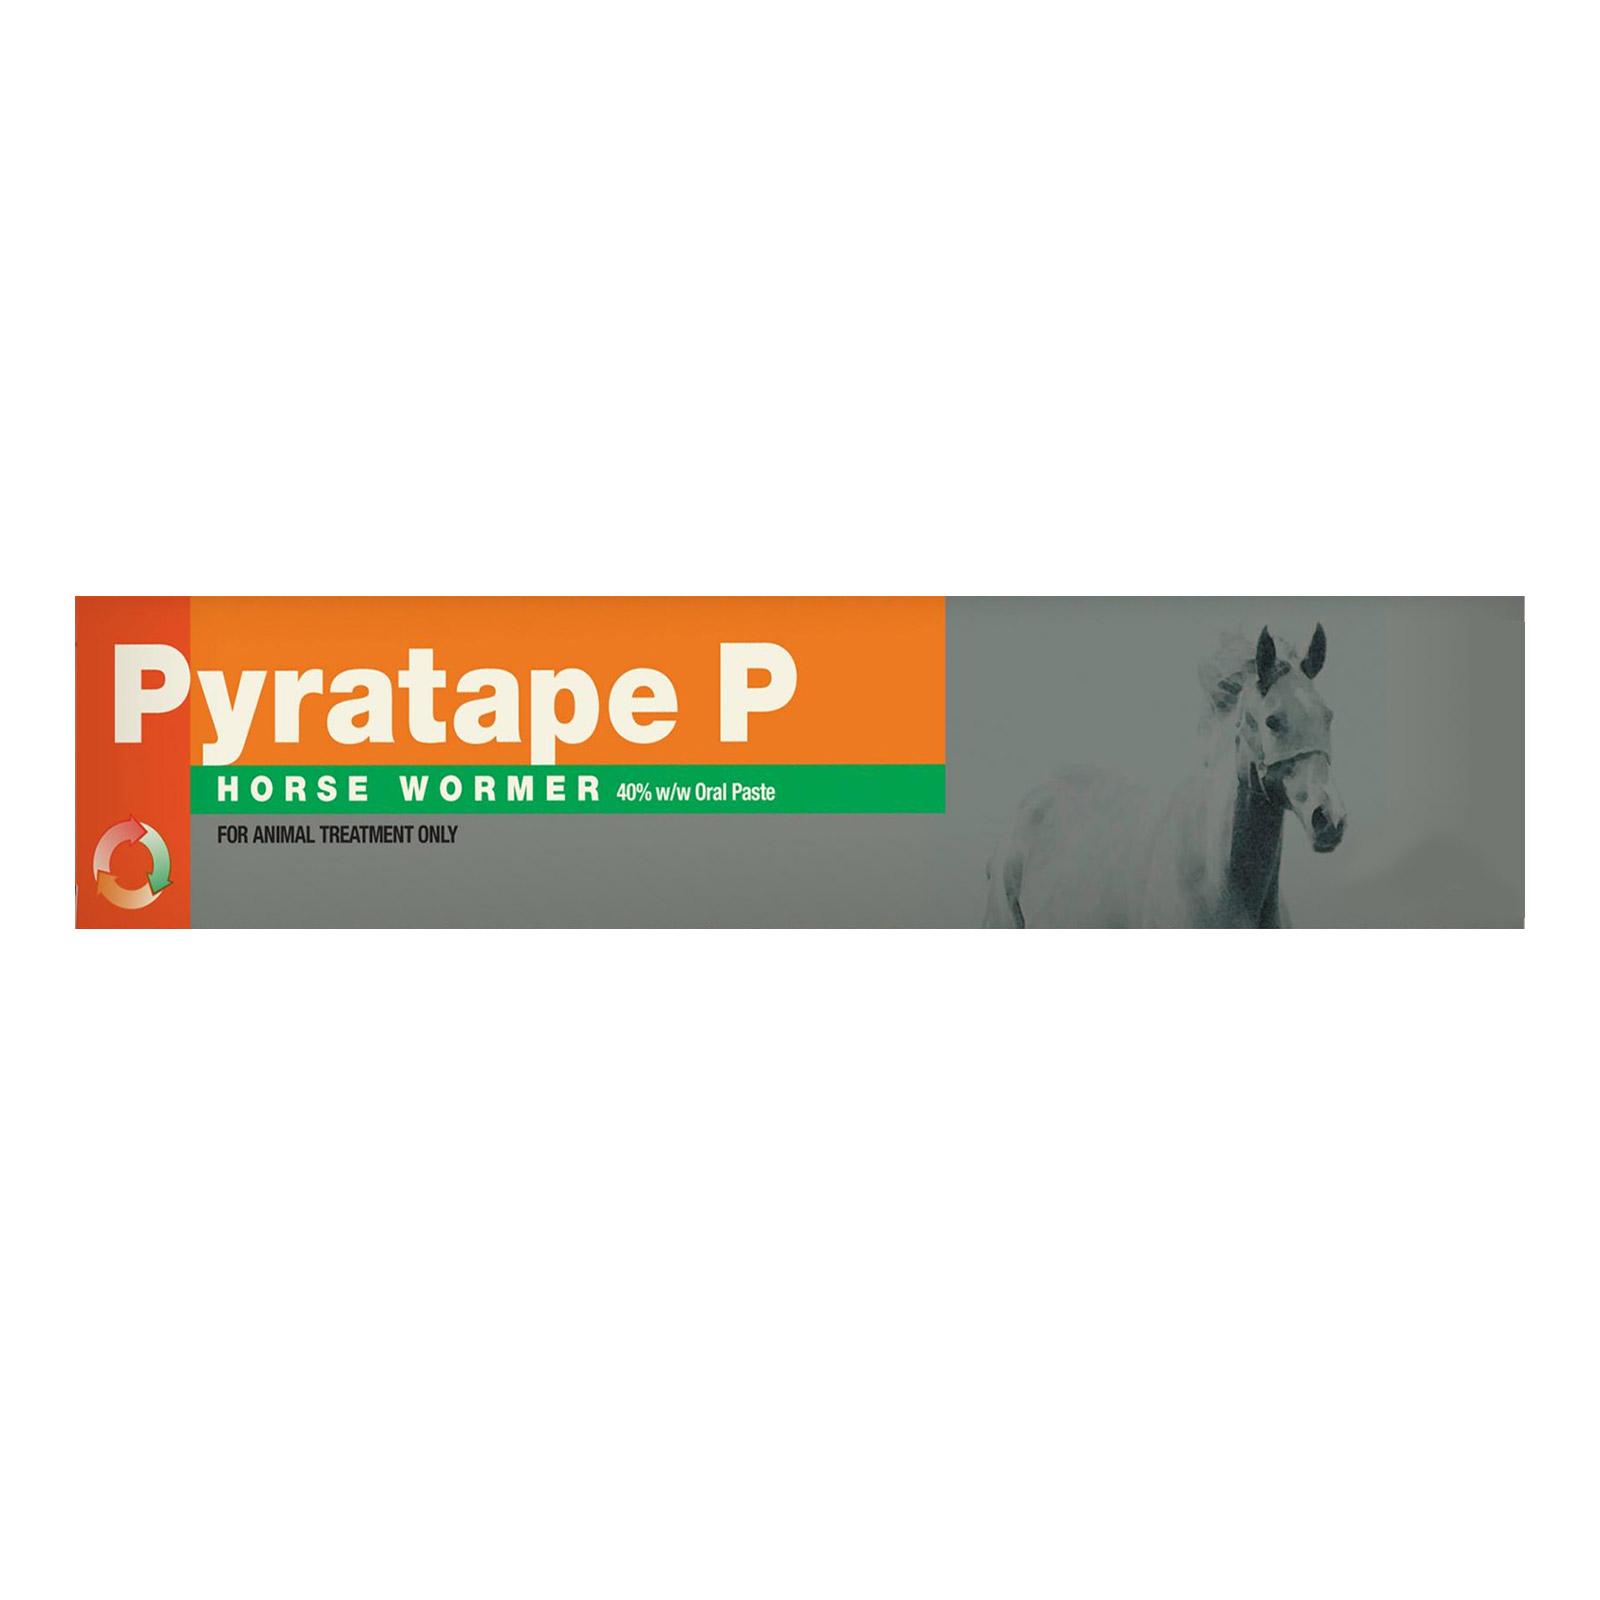 Pyratape-P-Horse-Worming-Paste-28